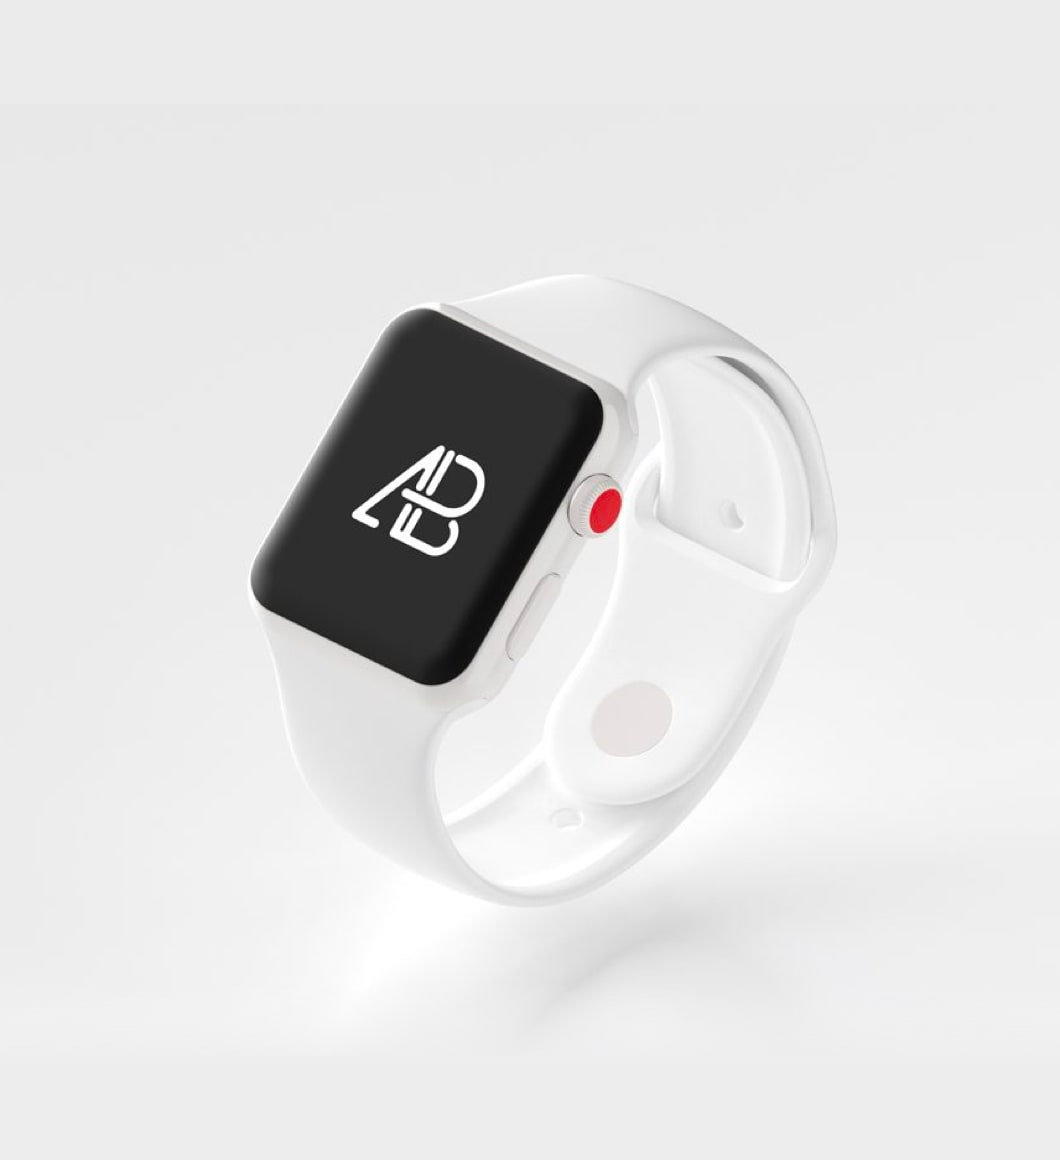 Apple Watch Series 3 (GPS, 36mm) - Space Gray